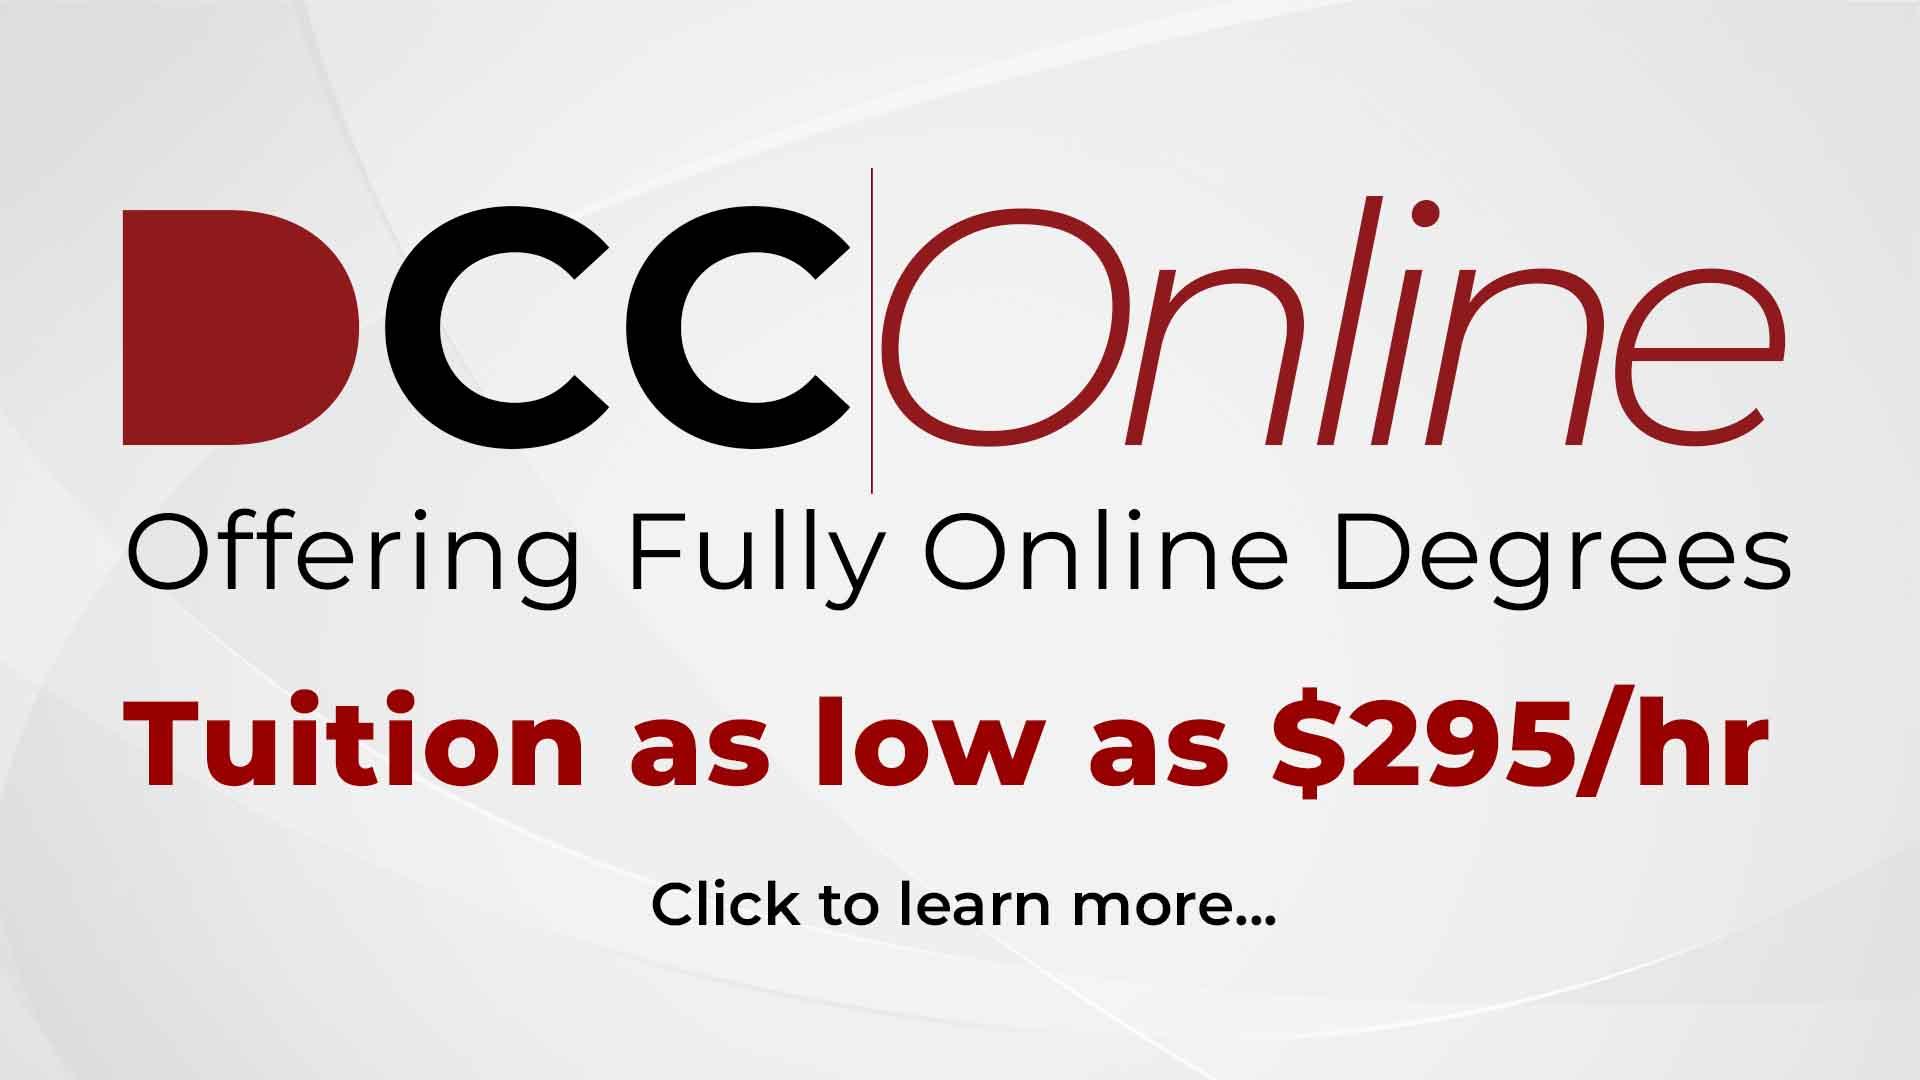 DCC Online